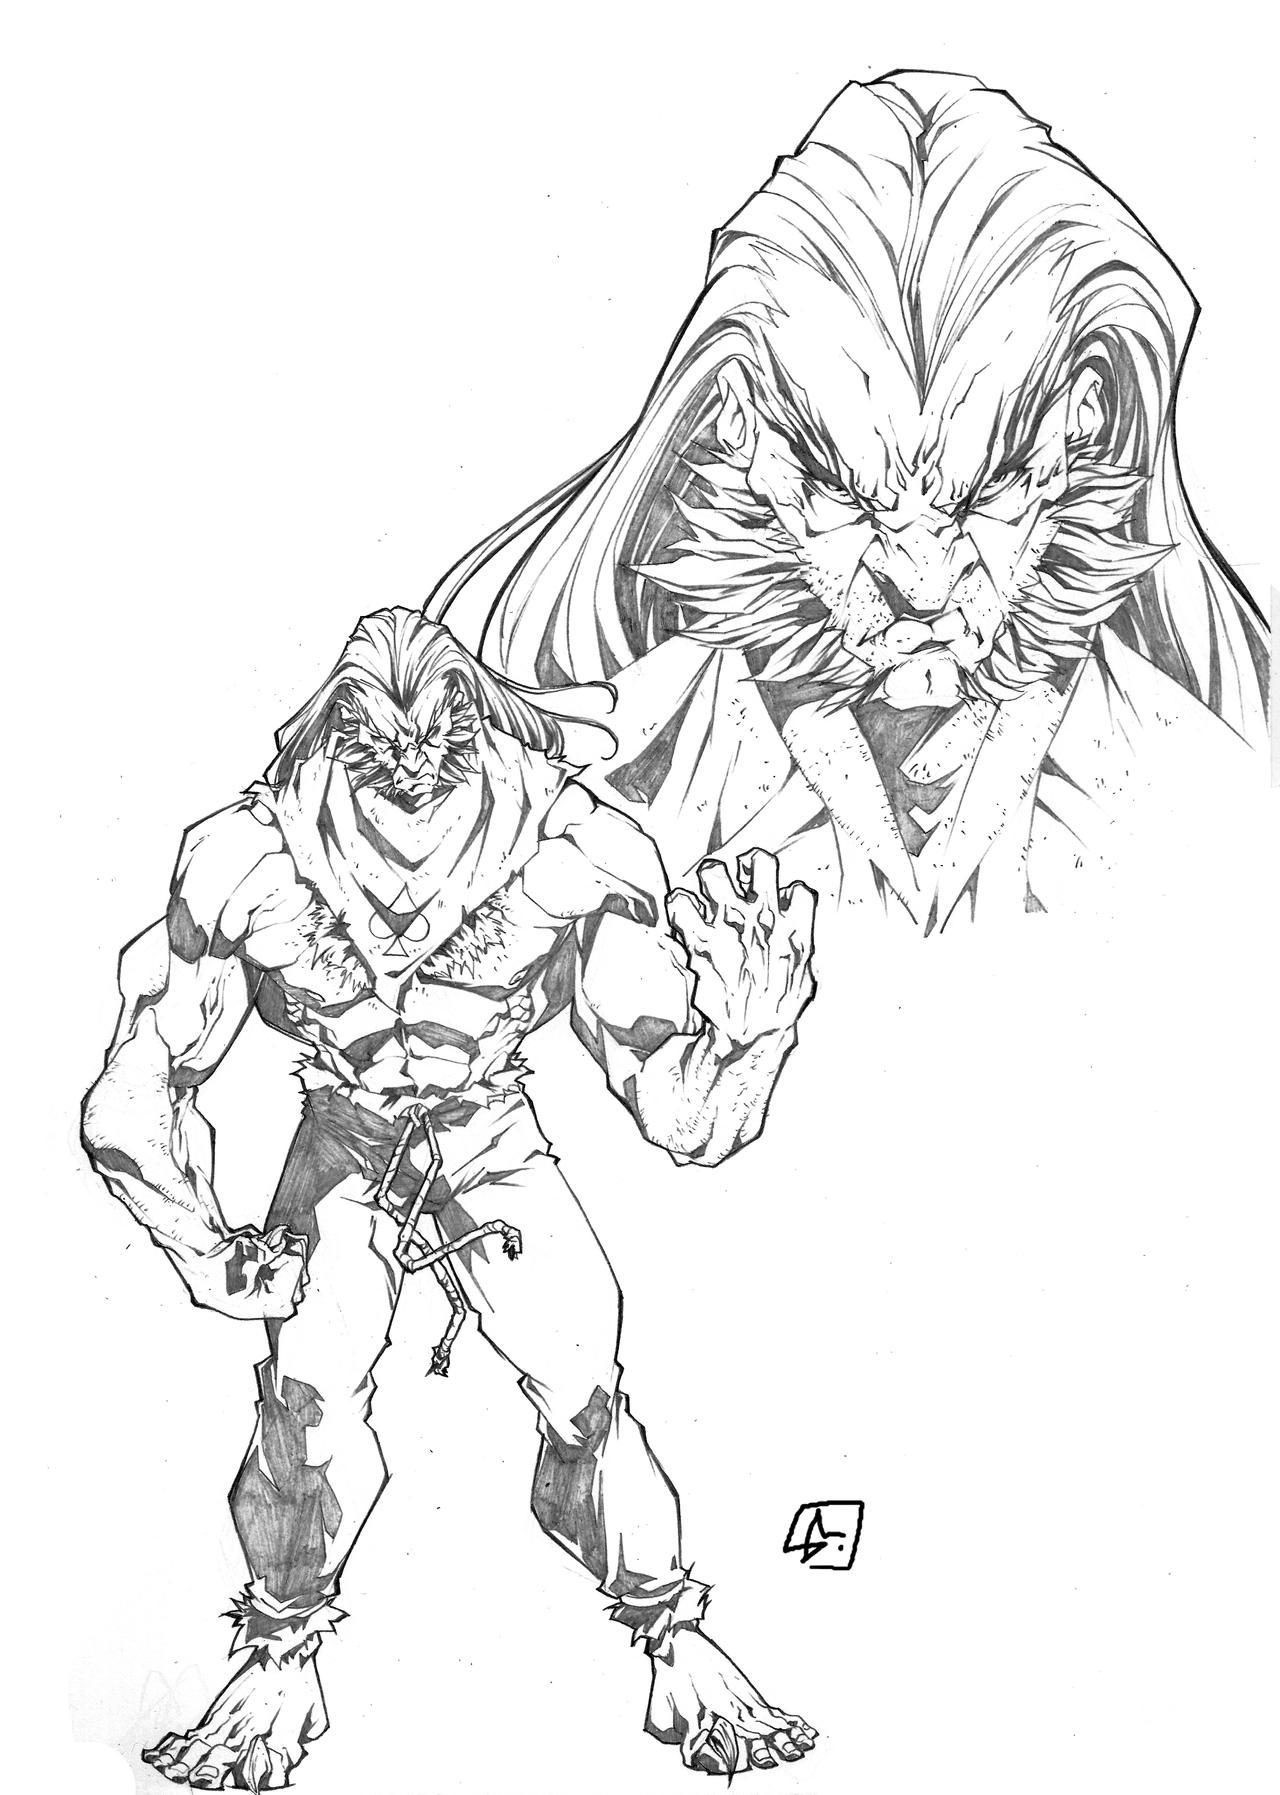 Deviantart Character Design Commission : Lion character design commission by marvelmania on deviantart